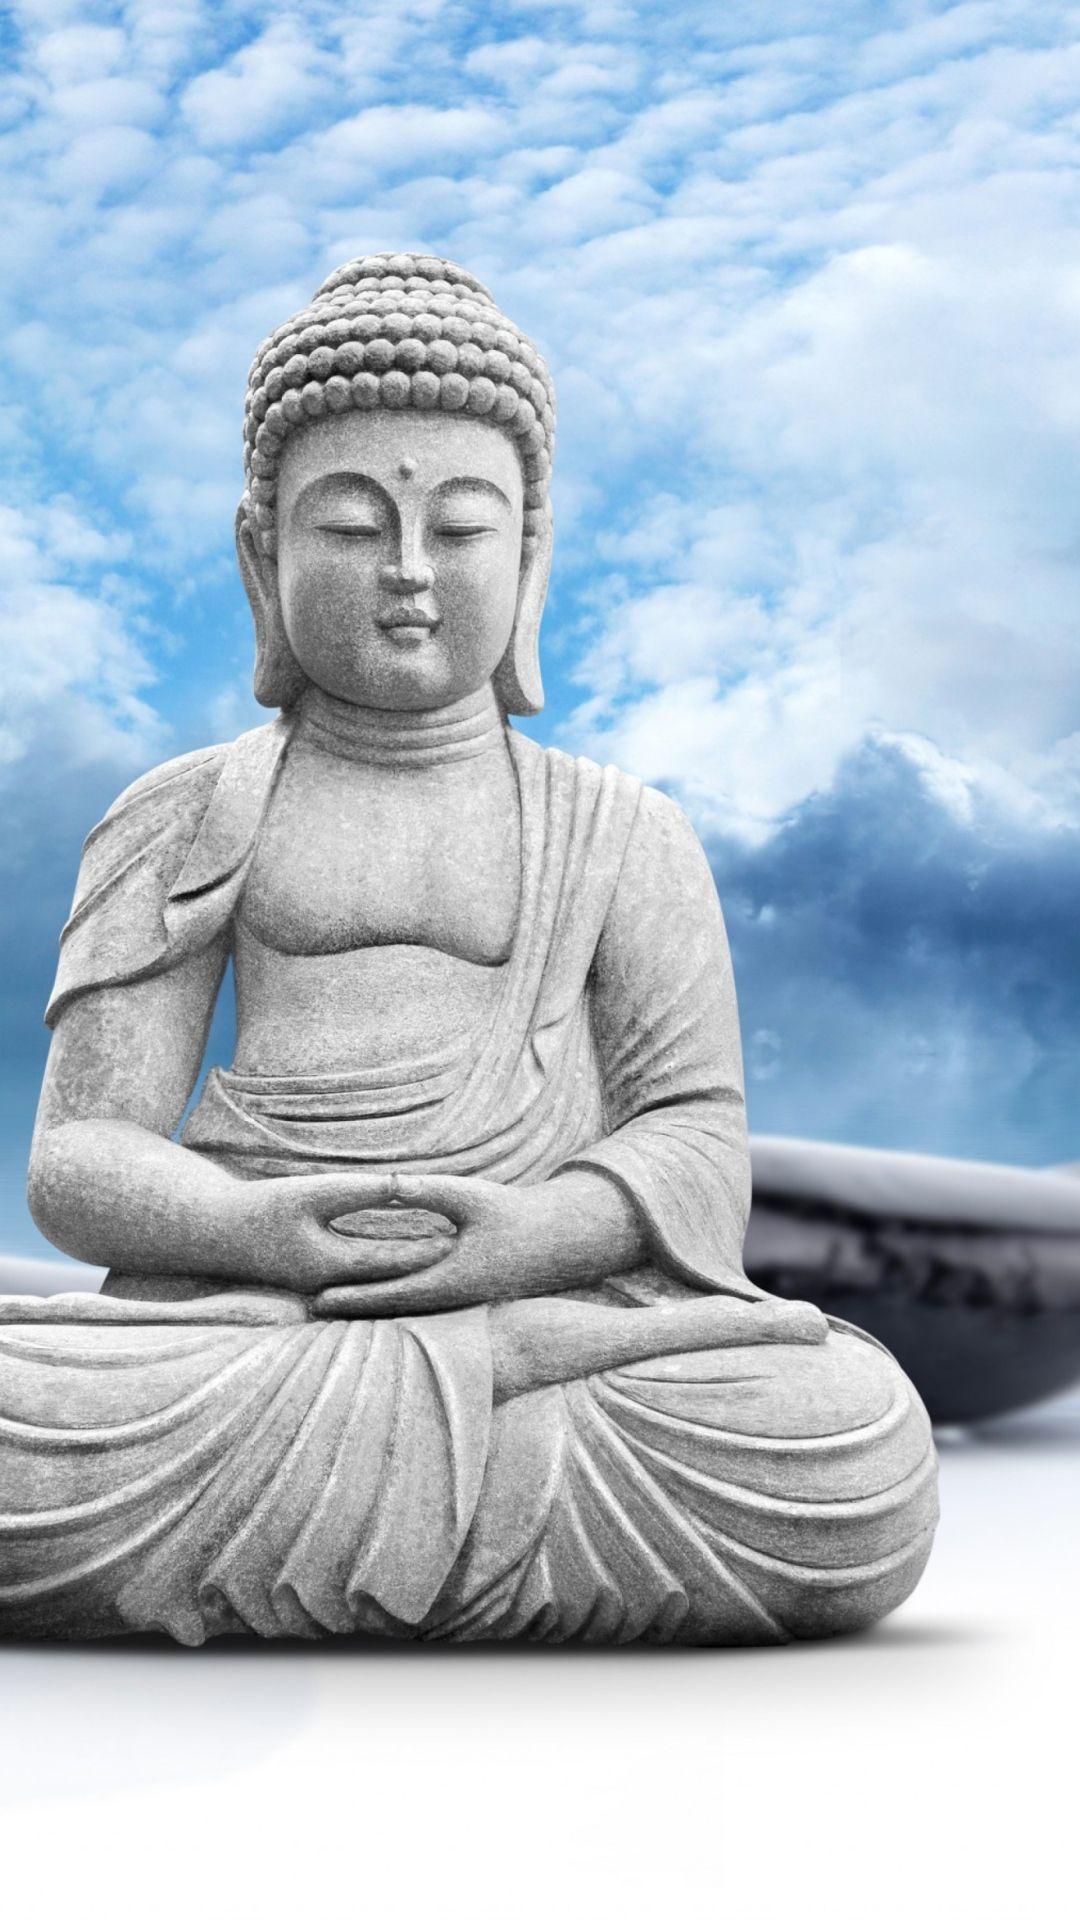 2020 Other Images Buddha Iphone Wallpaper Buddha Thoughts Buddha Quote Buddha